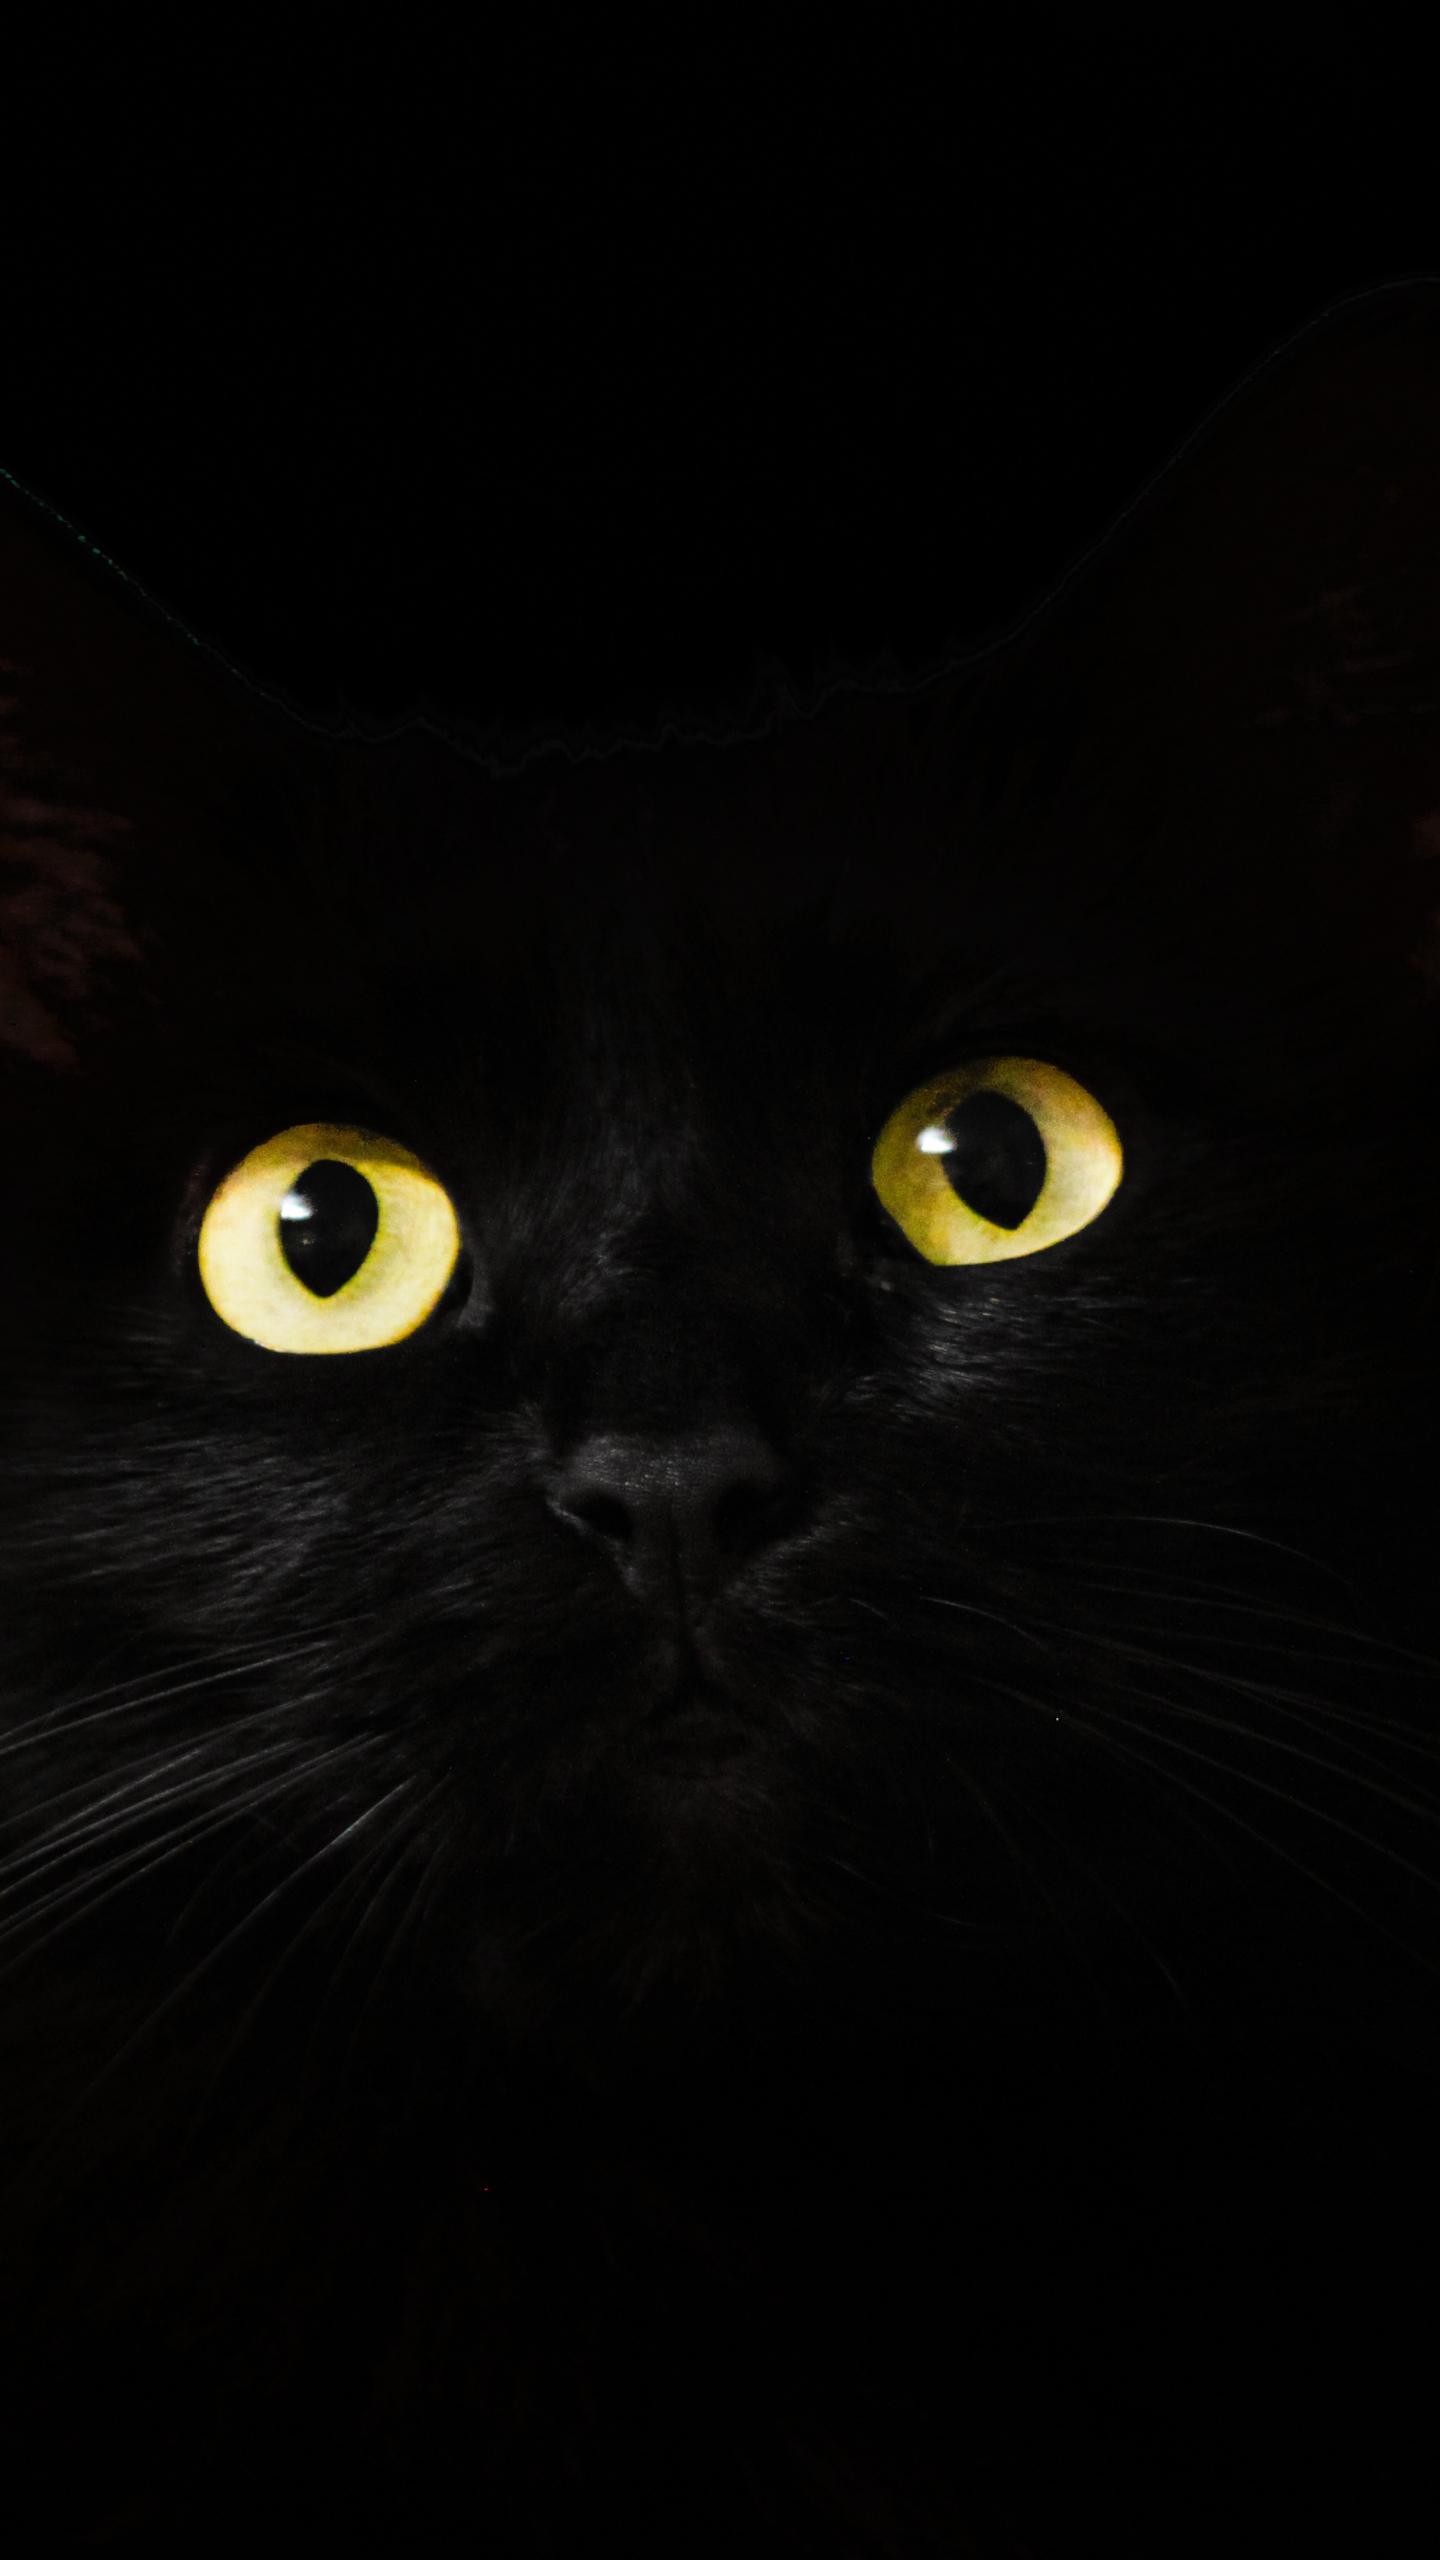 Download 1440x2560 wallpaper black cat, muzzle, animal, yellow eyes, qhd samsung galaxy s6, s7